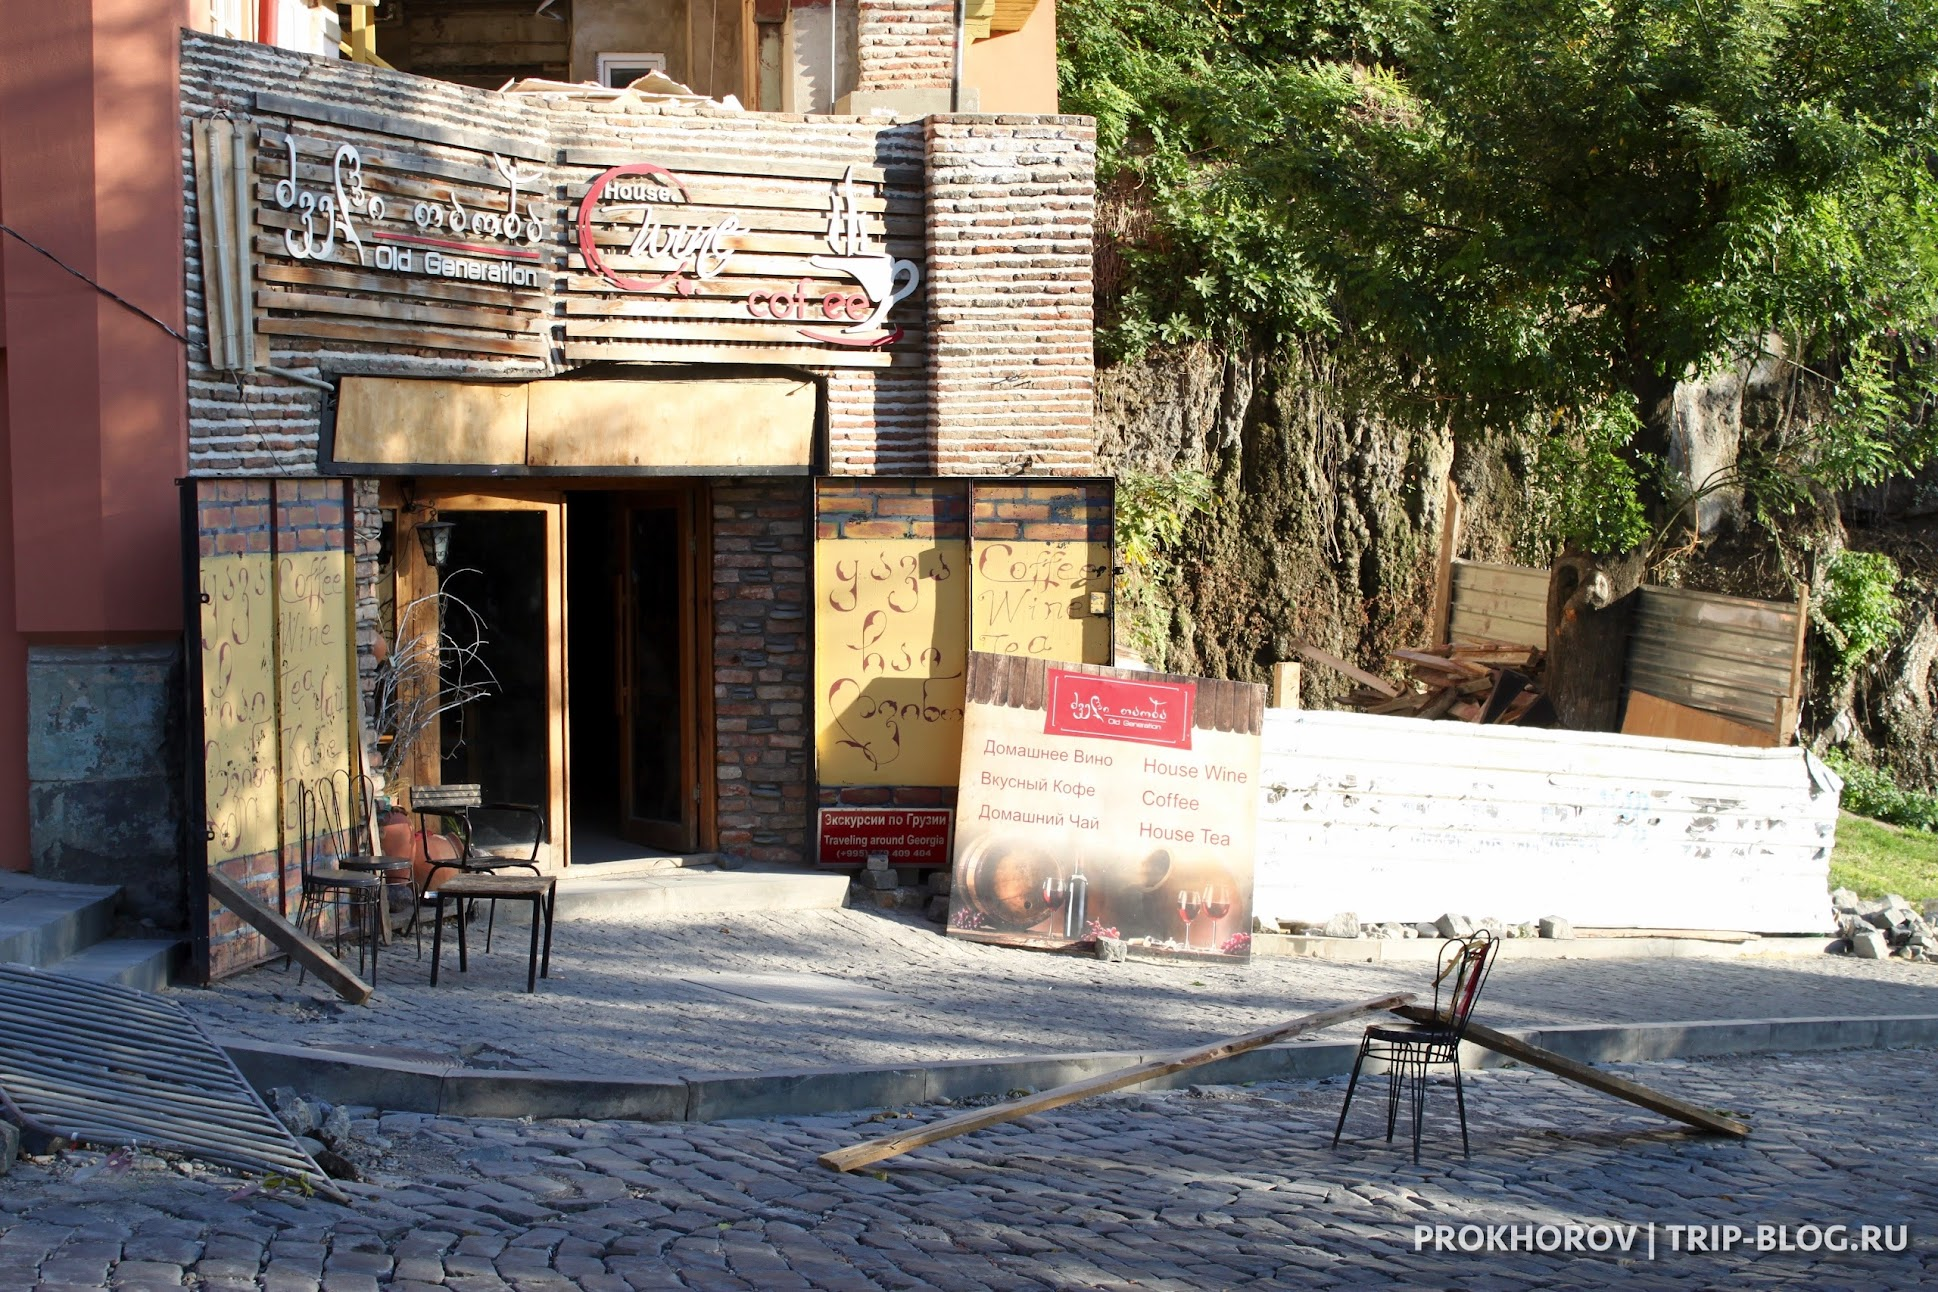 Old Generation Тбилиси